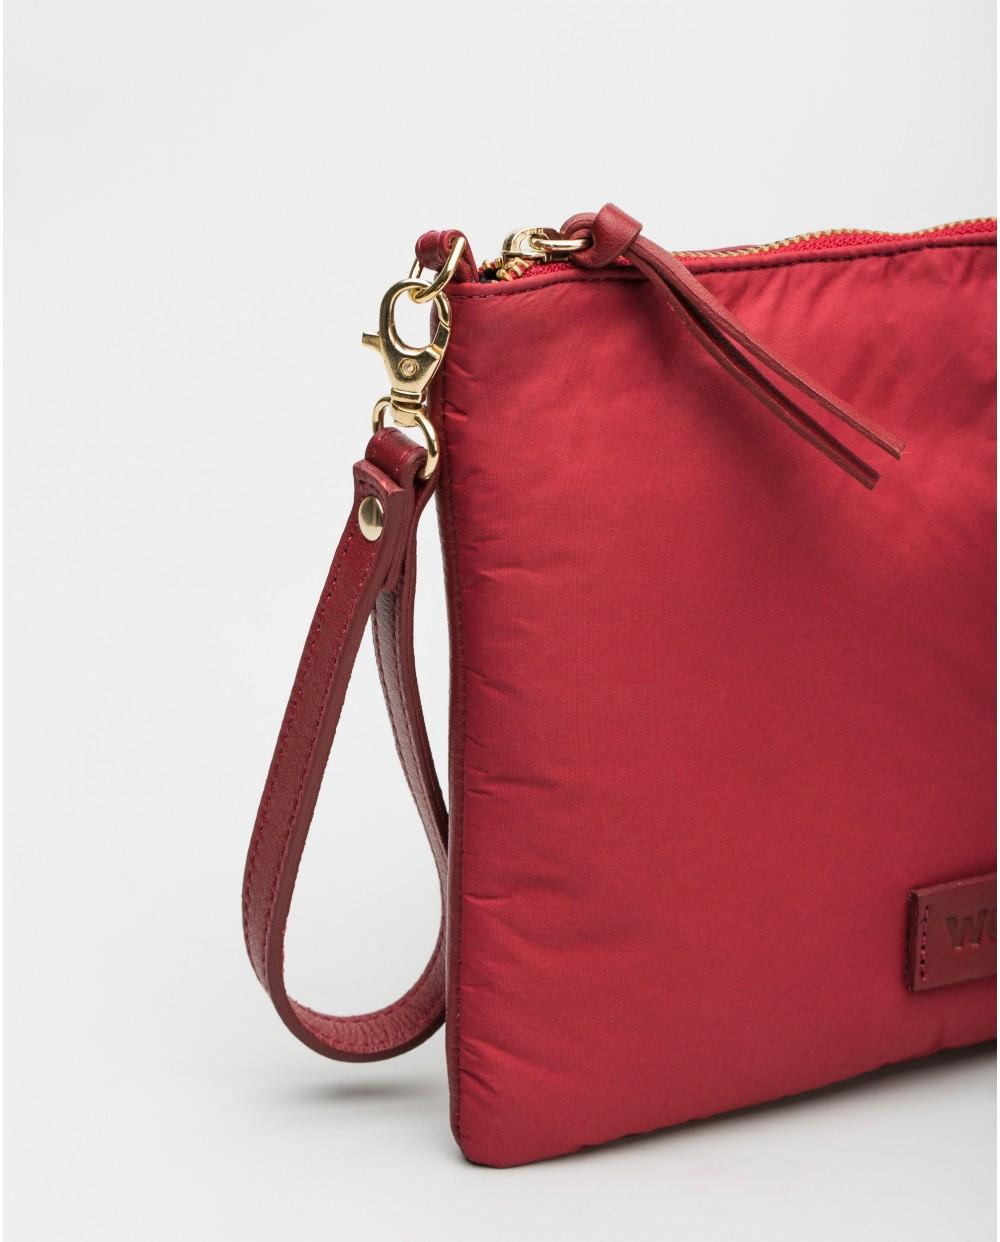 Wonders-Bags 30% OFF-Fabric handbag